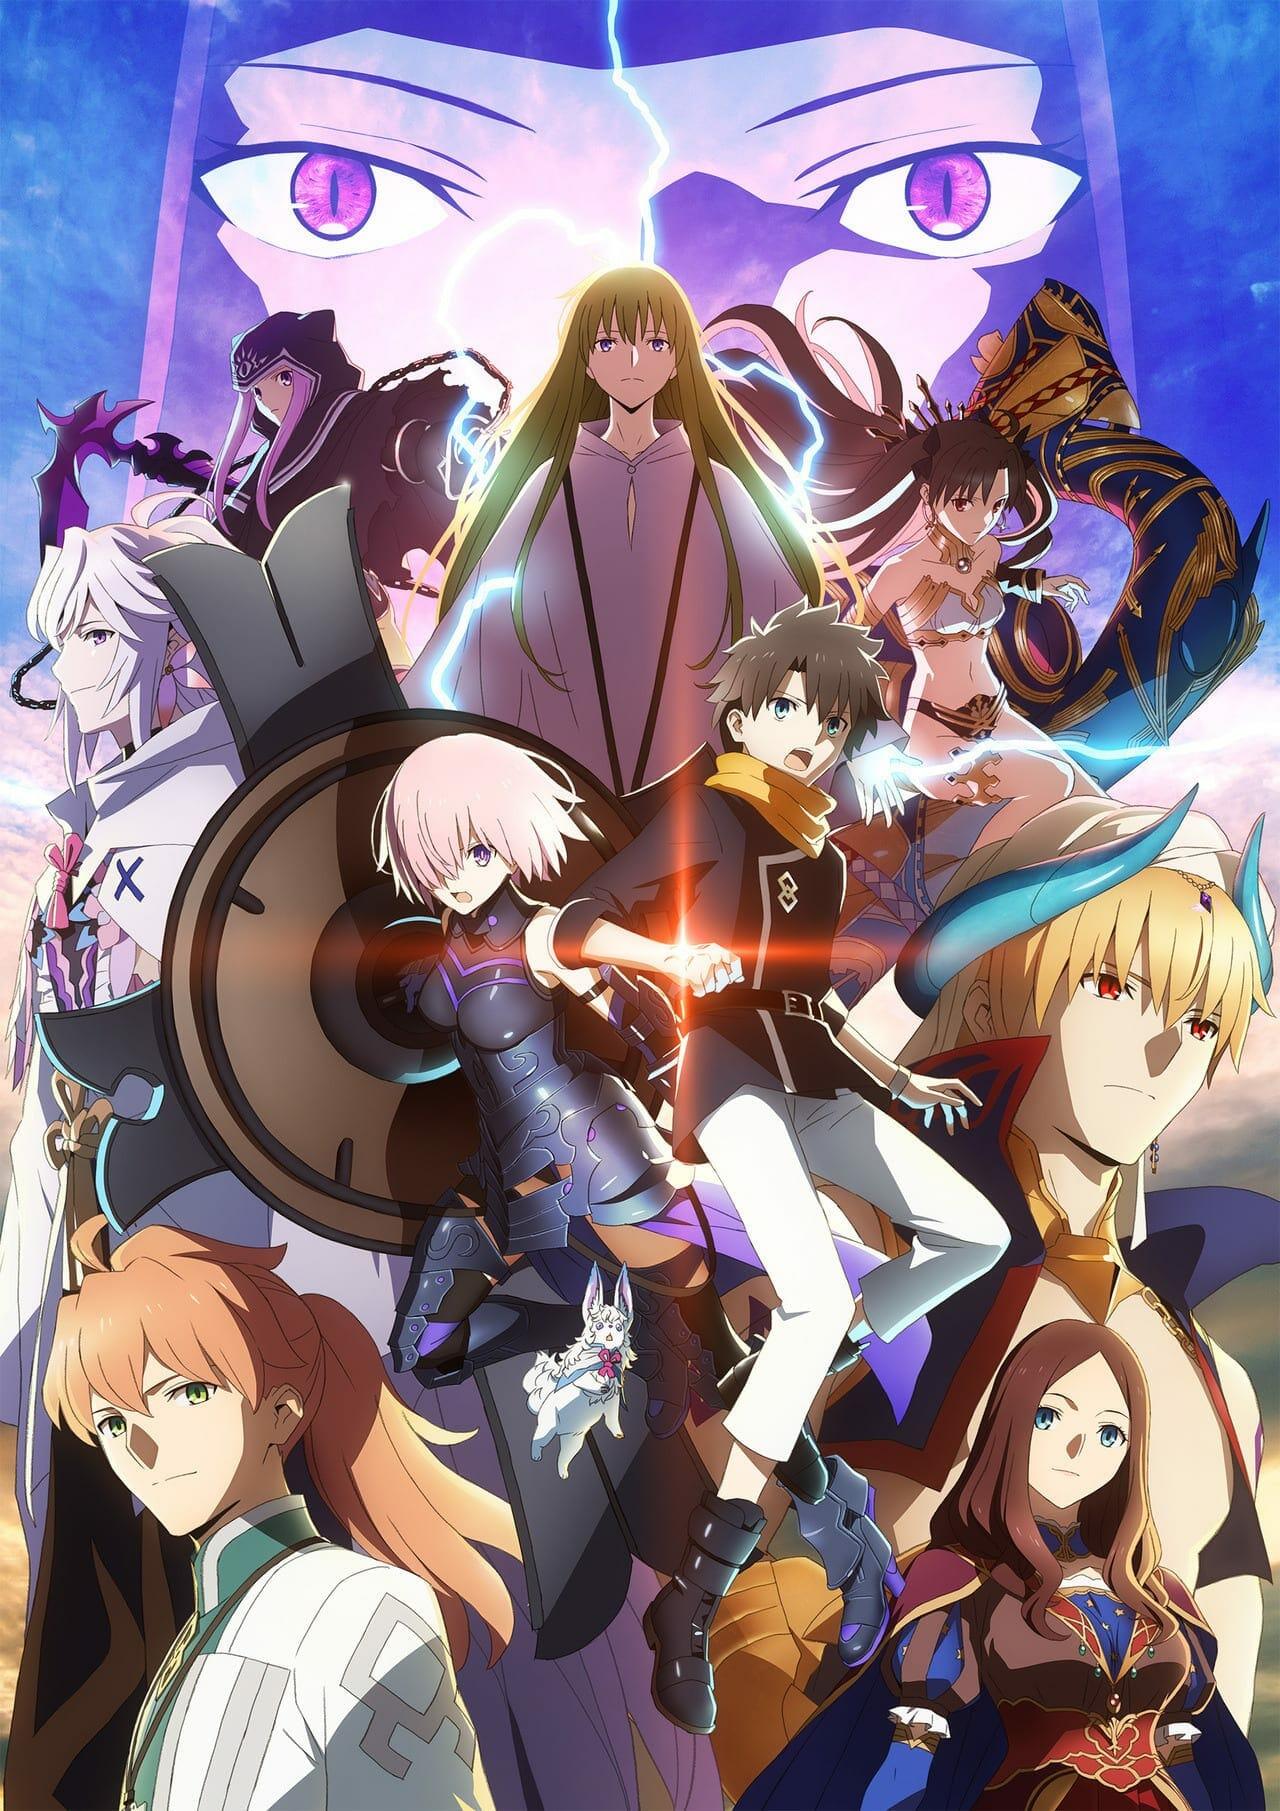 Fate/Grand Order: Babylonia anime